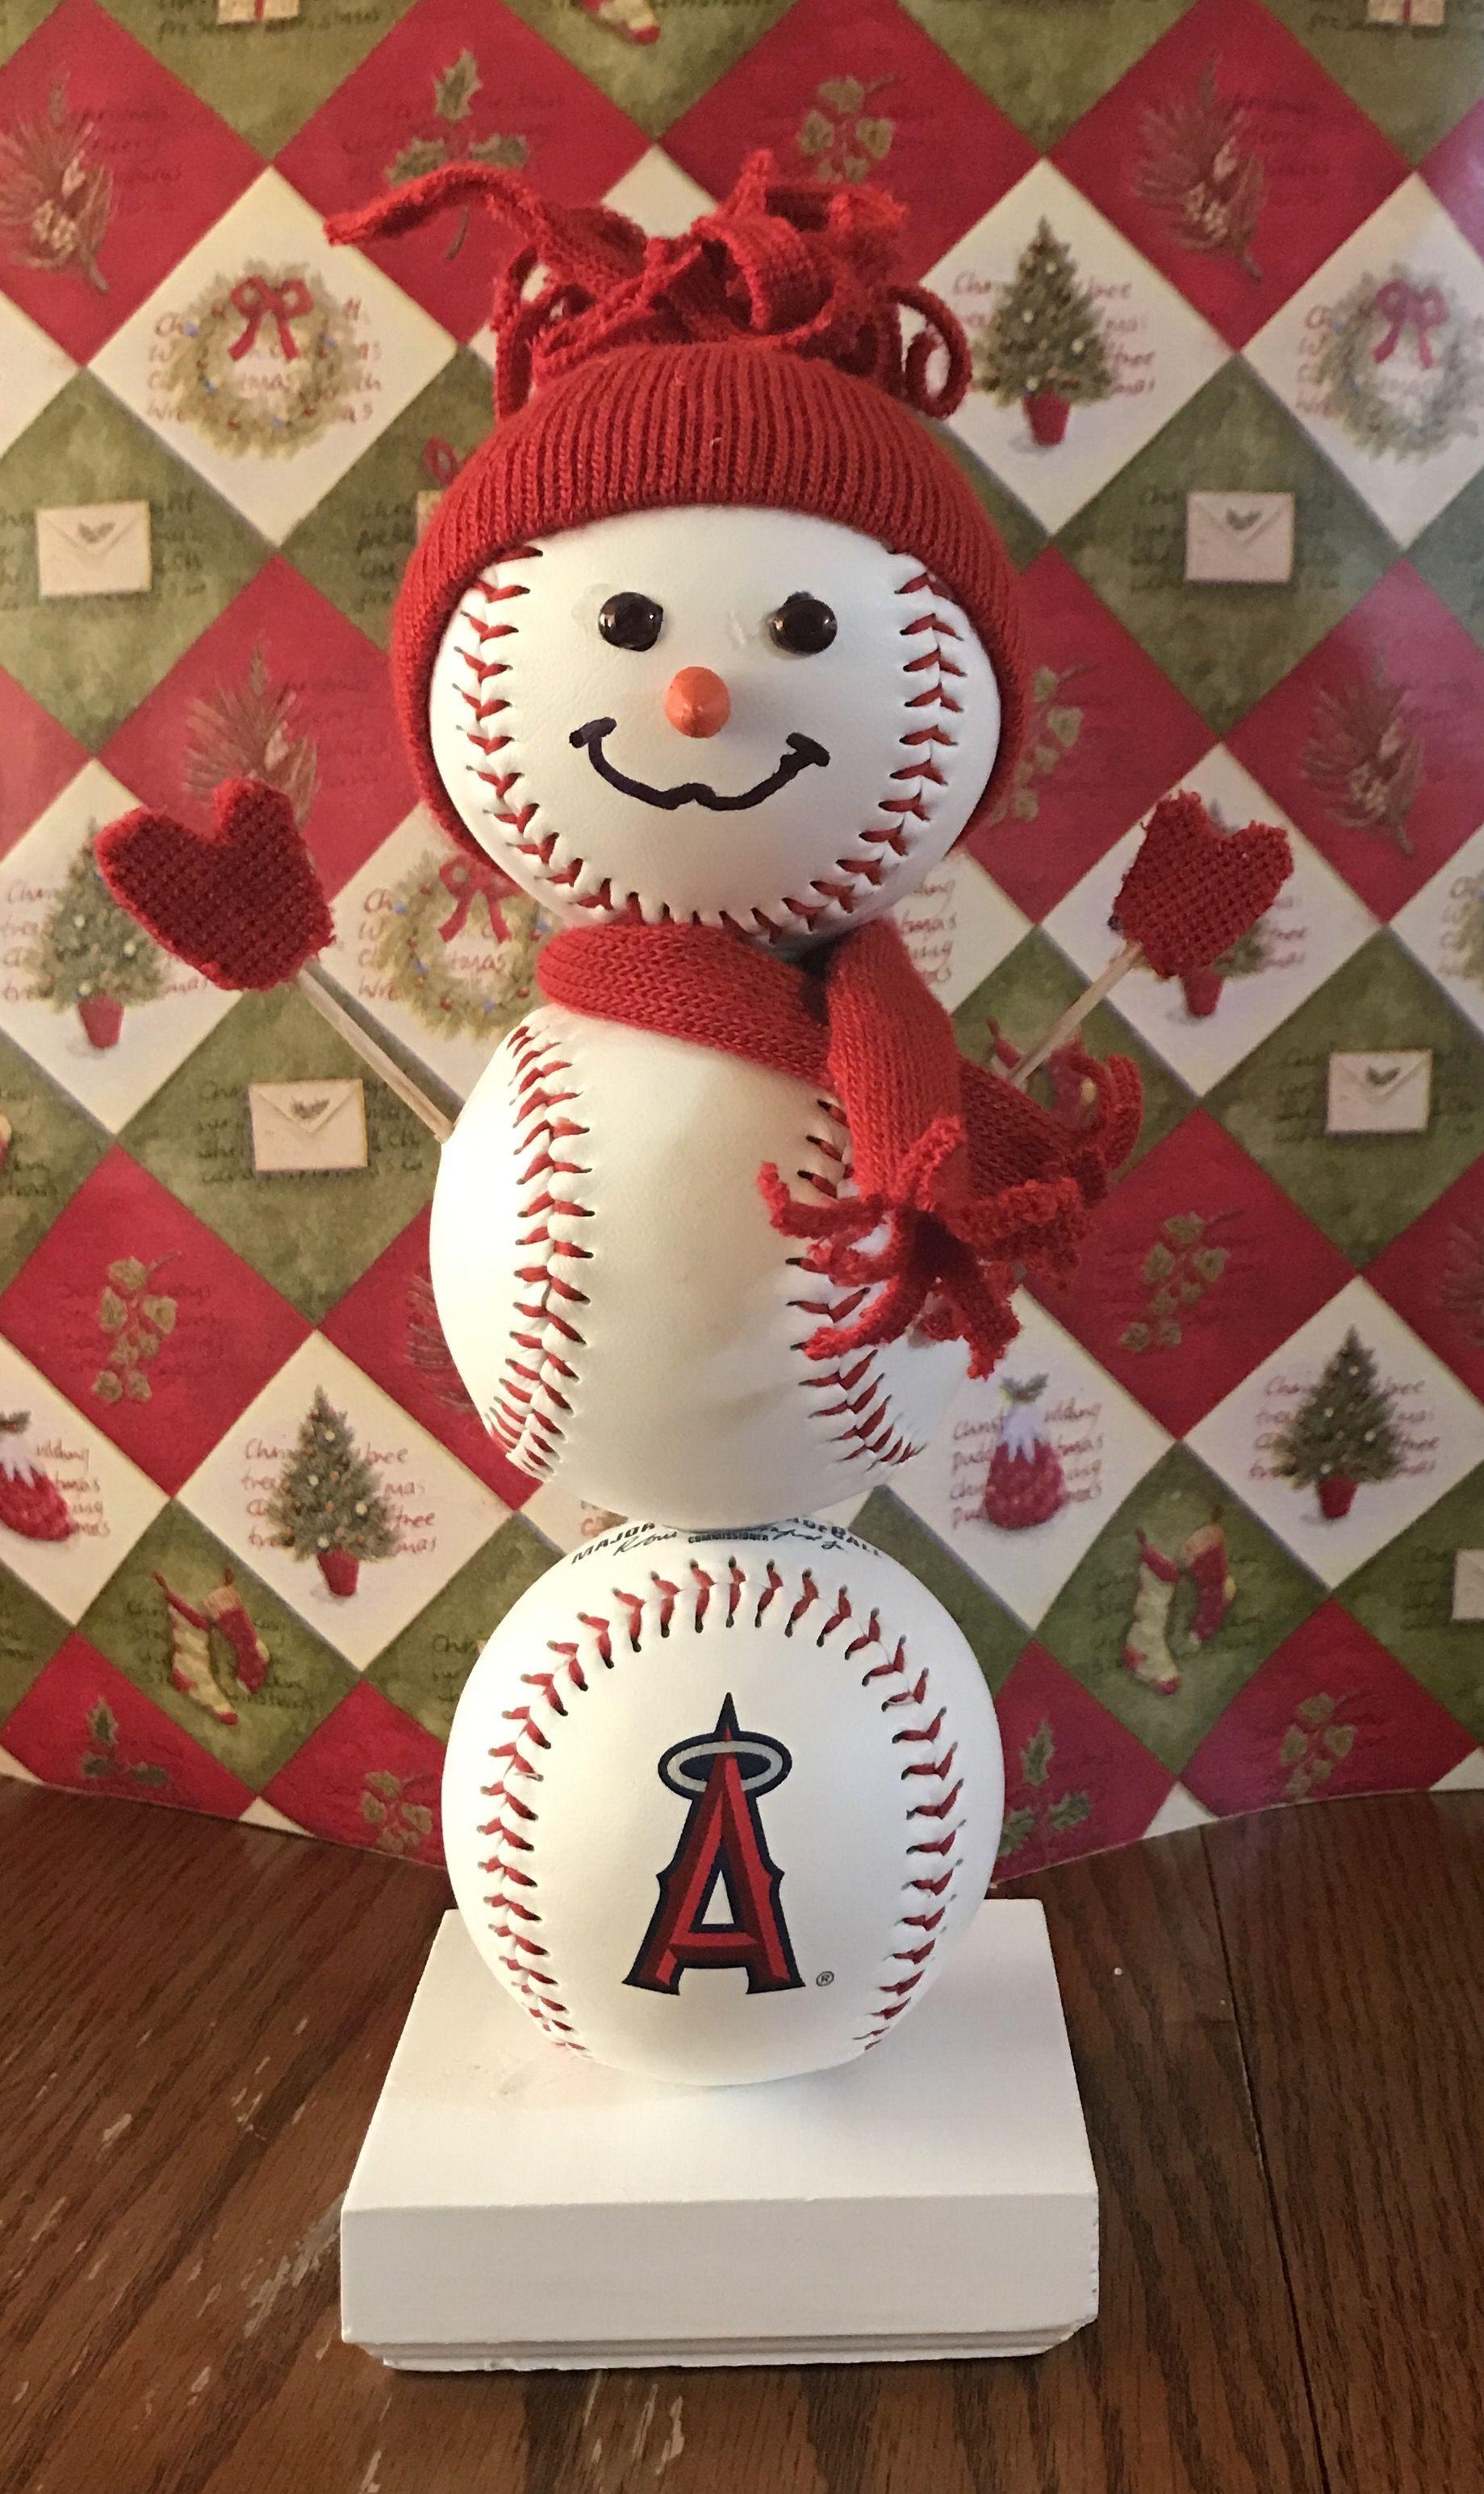 Angels Baseball Snowman Snowman Angels Laangels Baseball Christmas Tree Baseball Christmas Christmas Diy